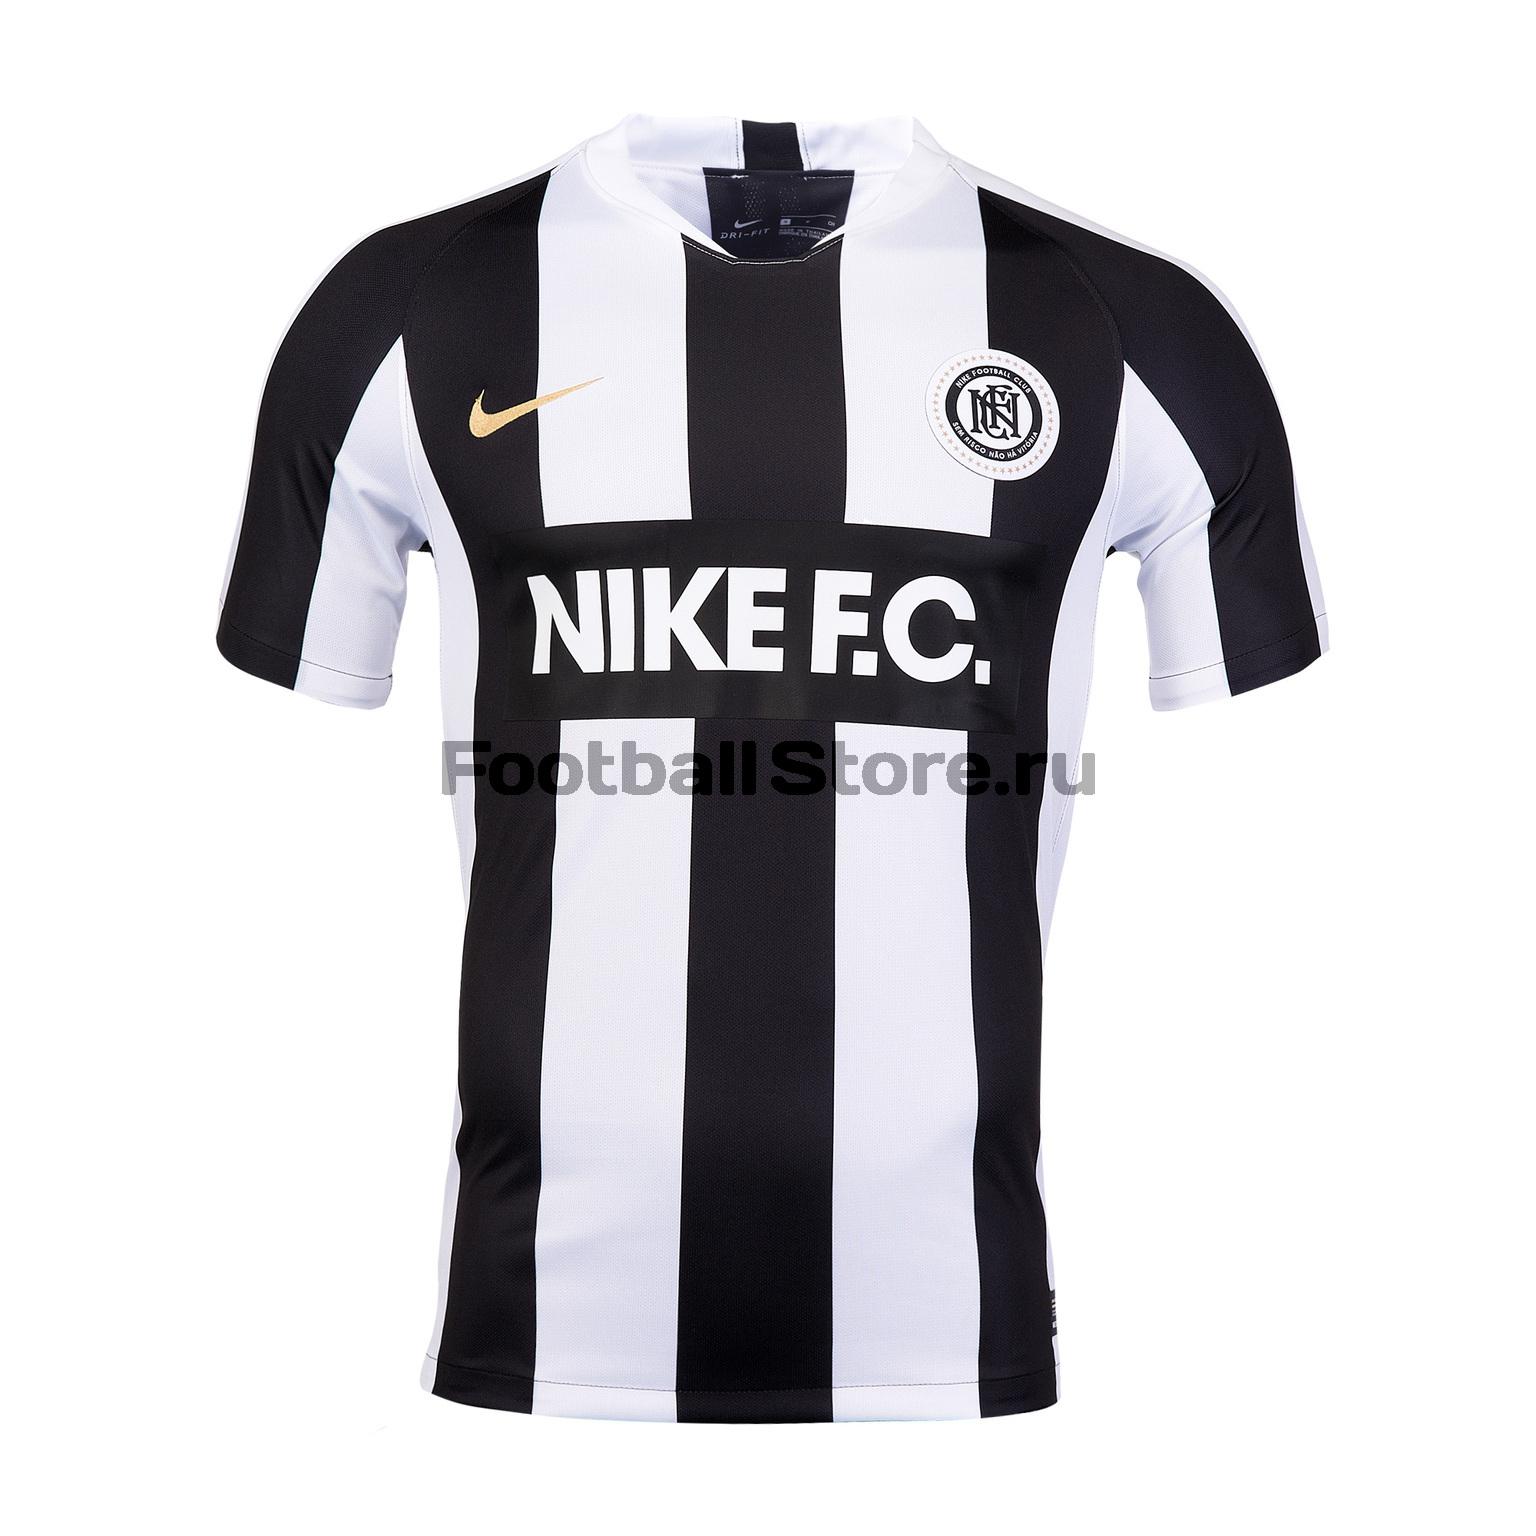 Футболка Nike F.C. Home AH9510-100